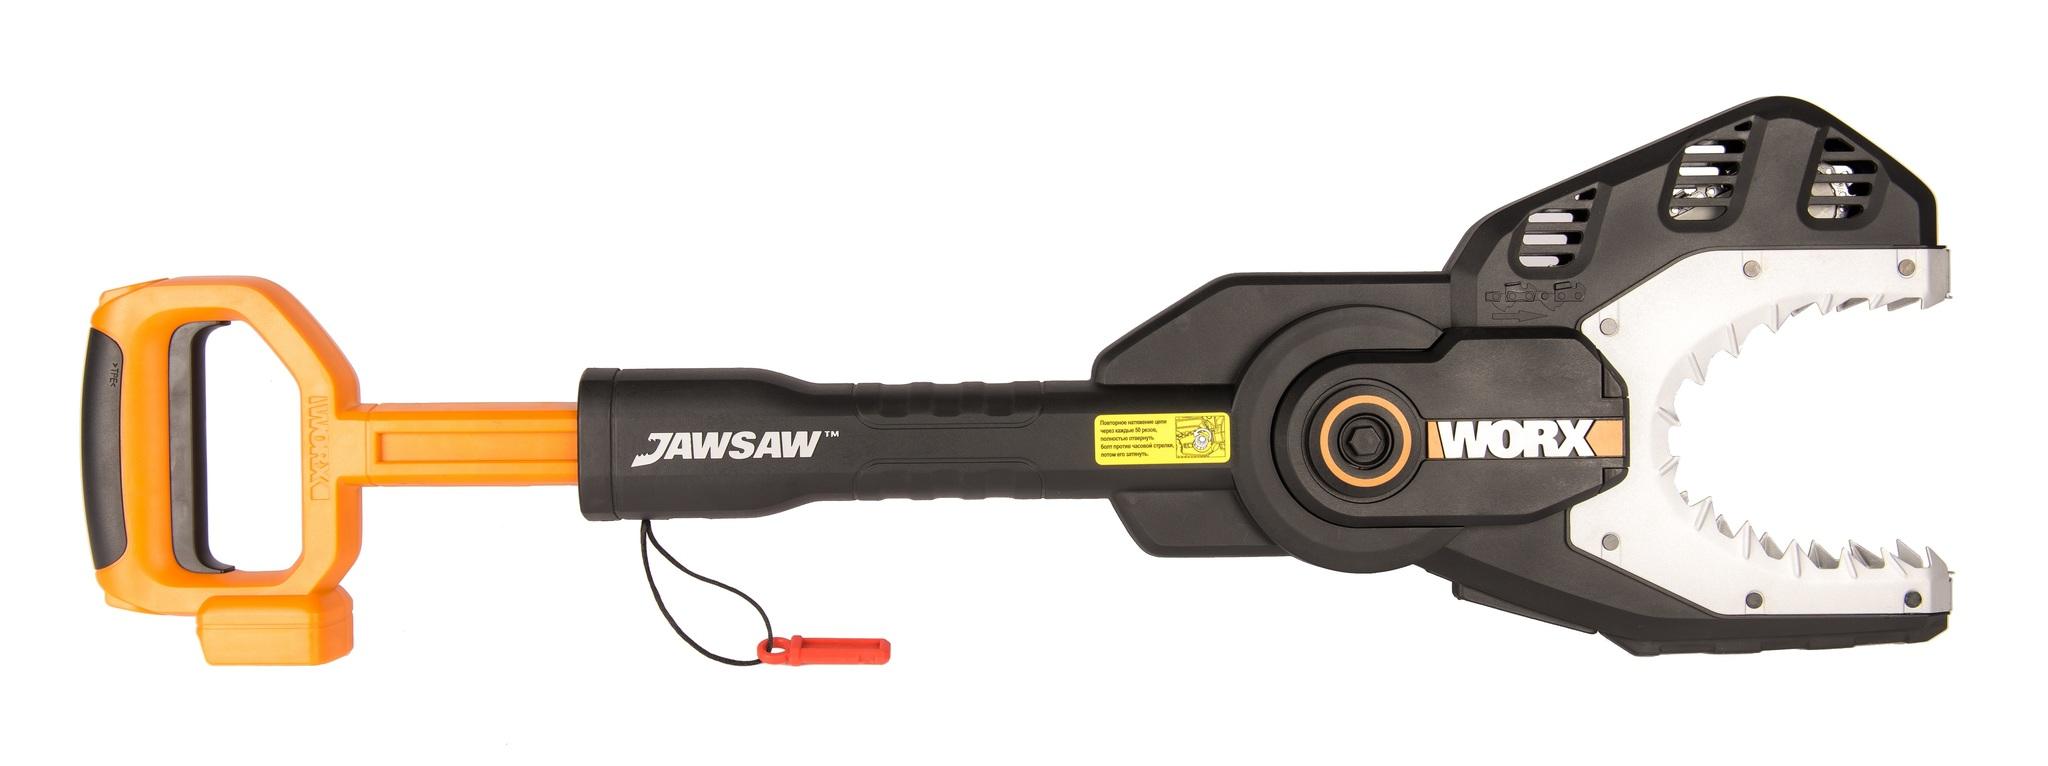 Пила аккумуляторная WORX JawSaw WG329E.9, 20В, без АКБ и ЗУ